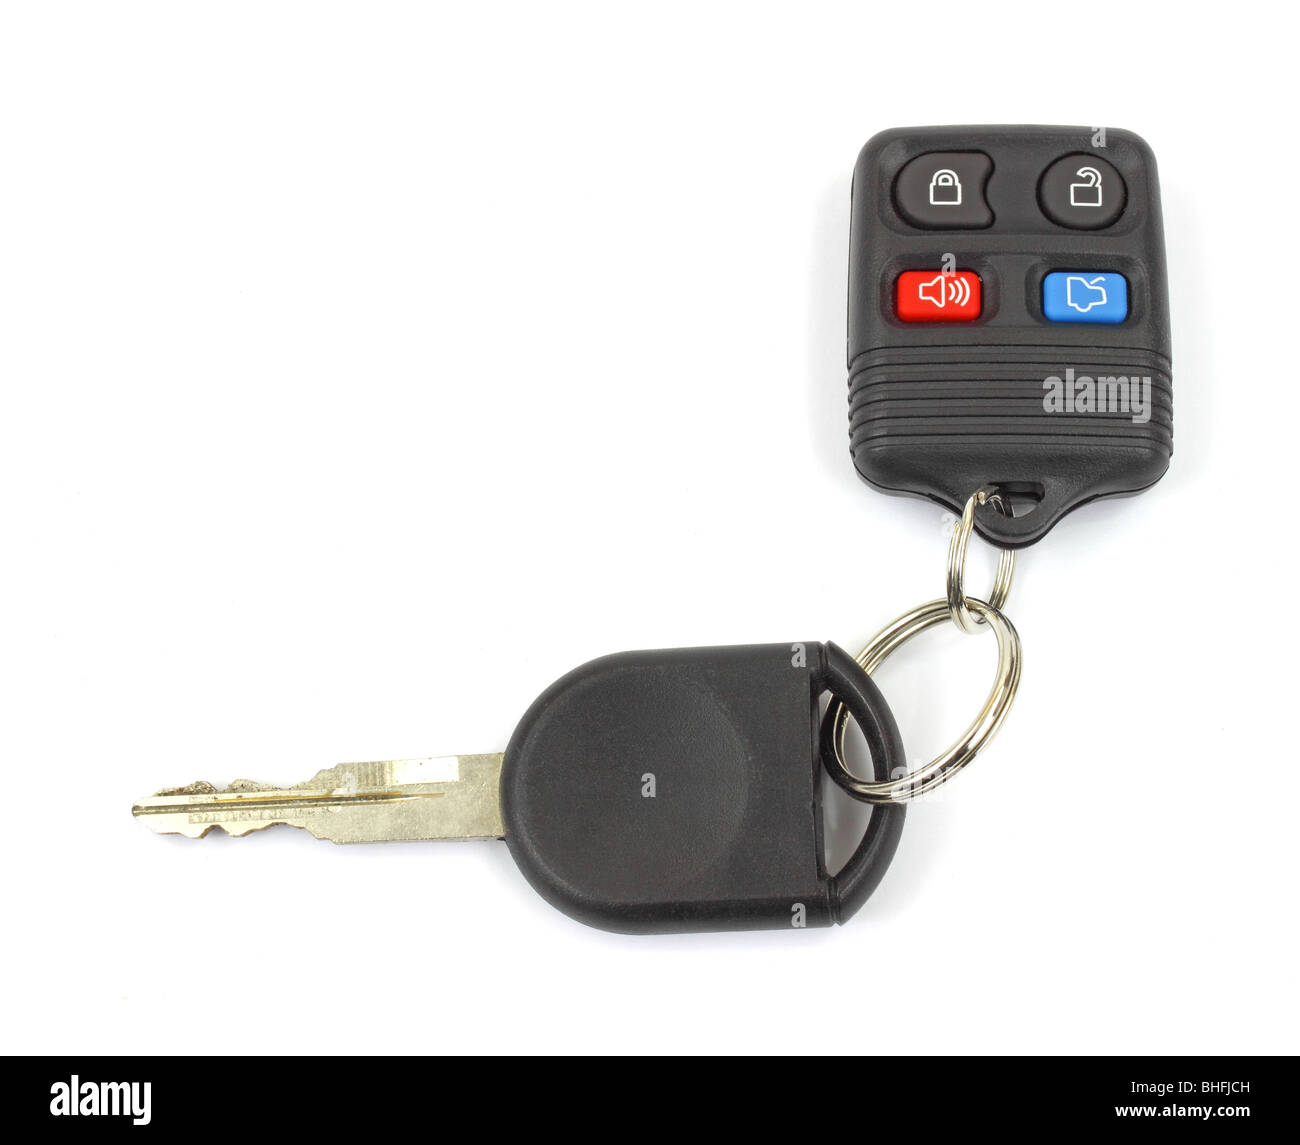 New car keys - Stock Image